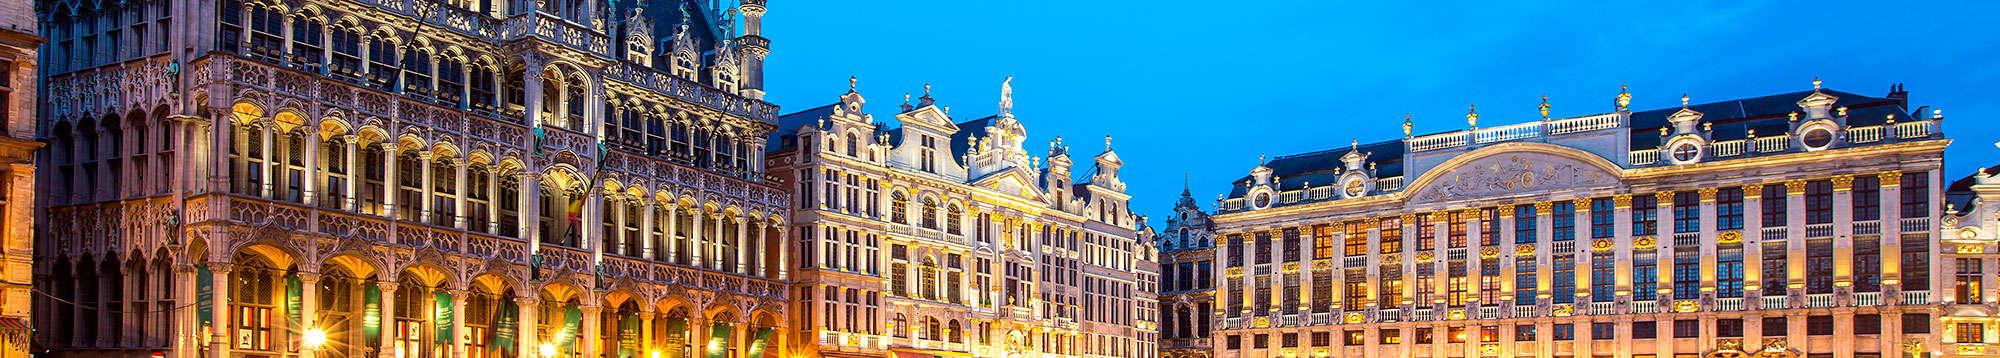 786957_2000_358_FSImage_1_edit_Bruxelles1.jpg